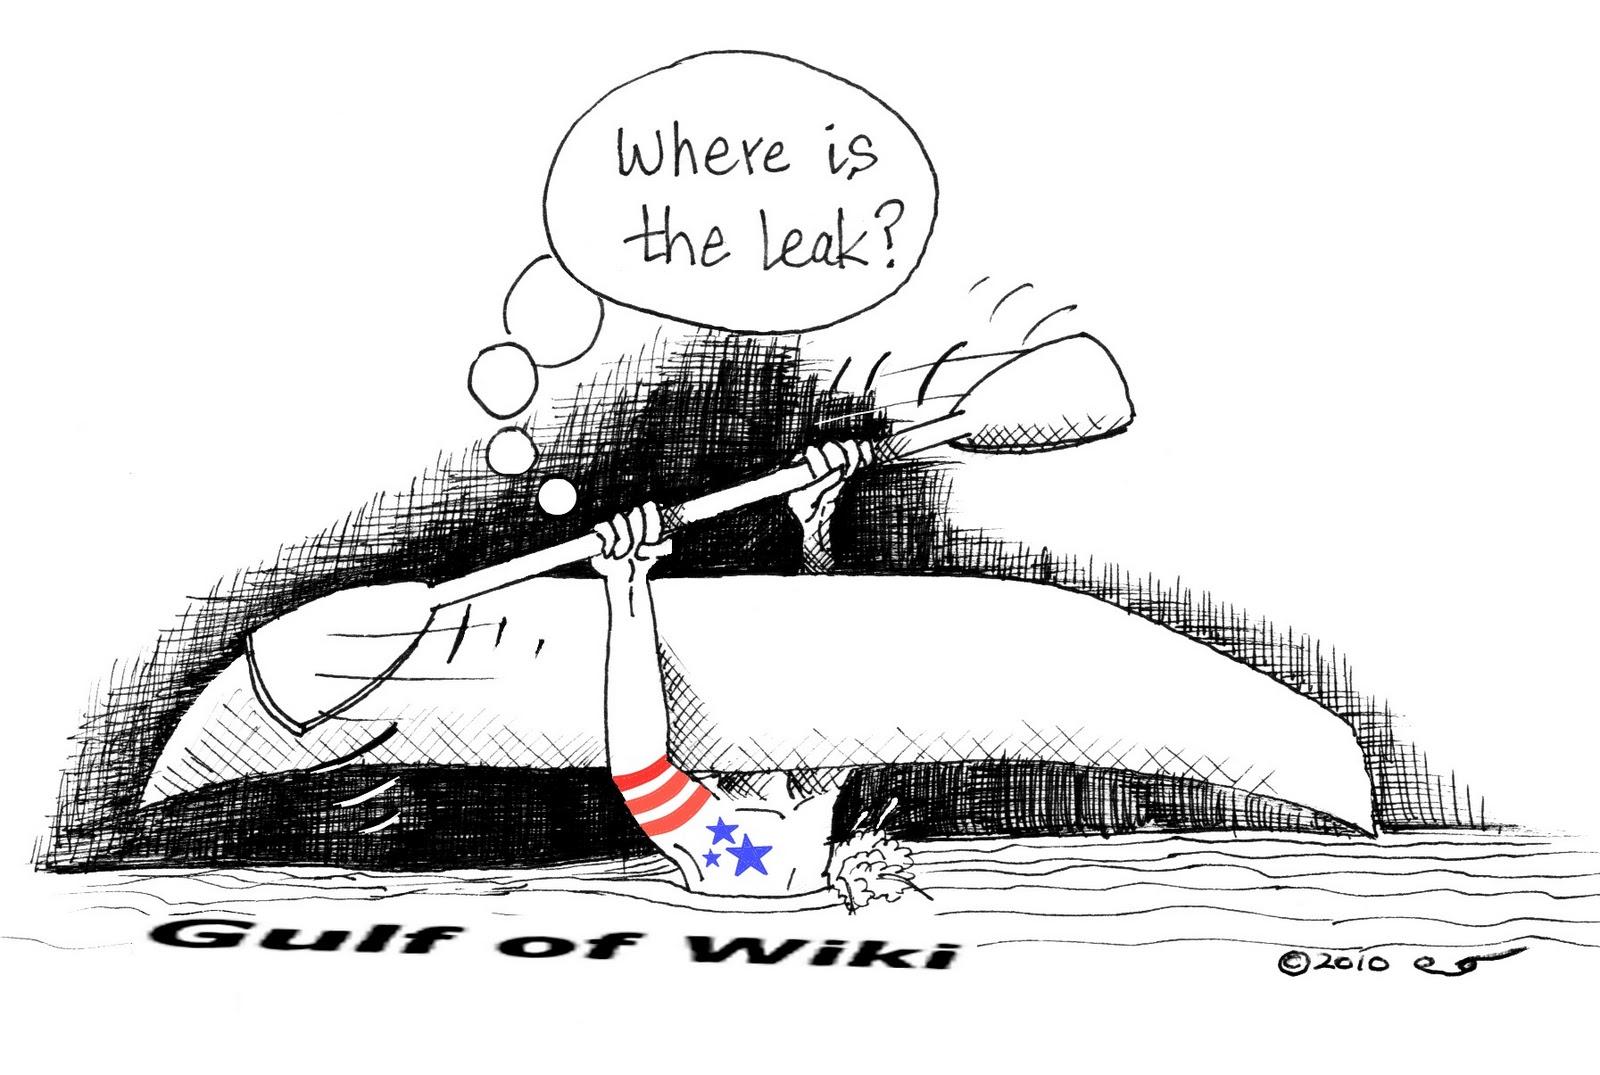 MdMIndia: Wikileaks Latest Wallpapers [part 4]